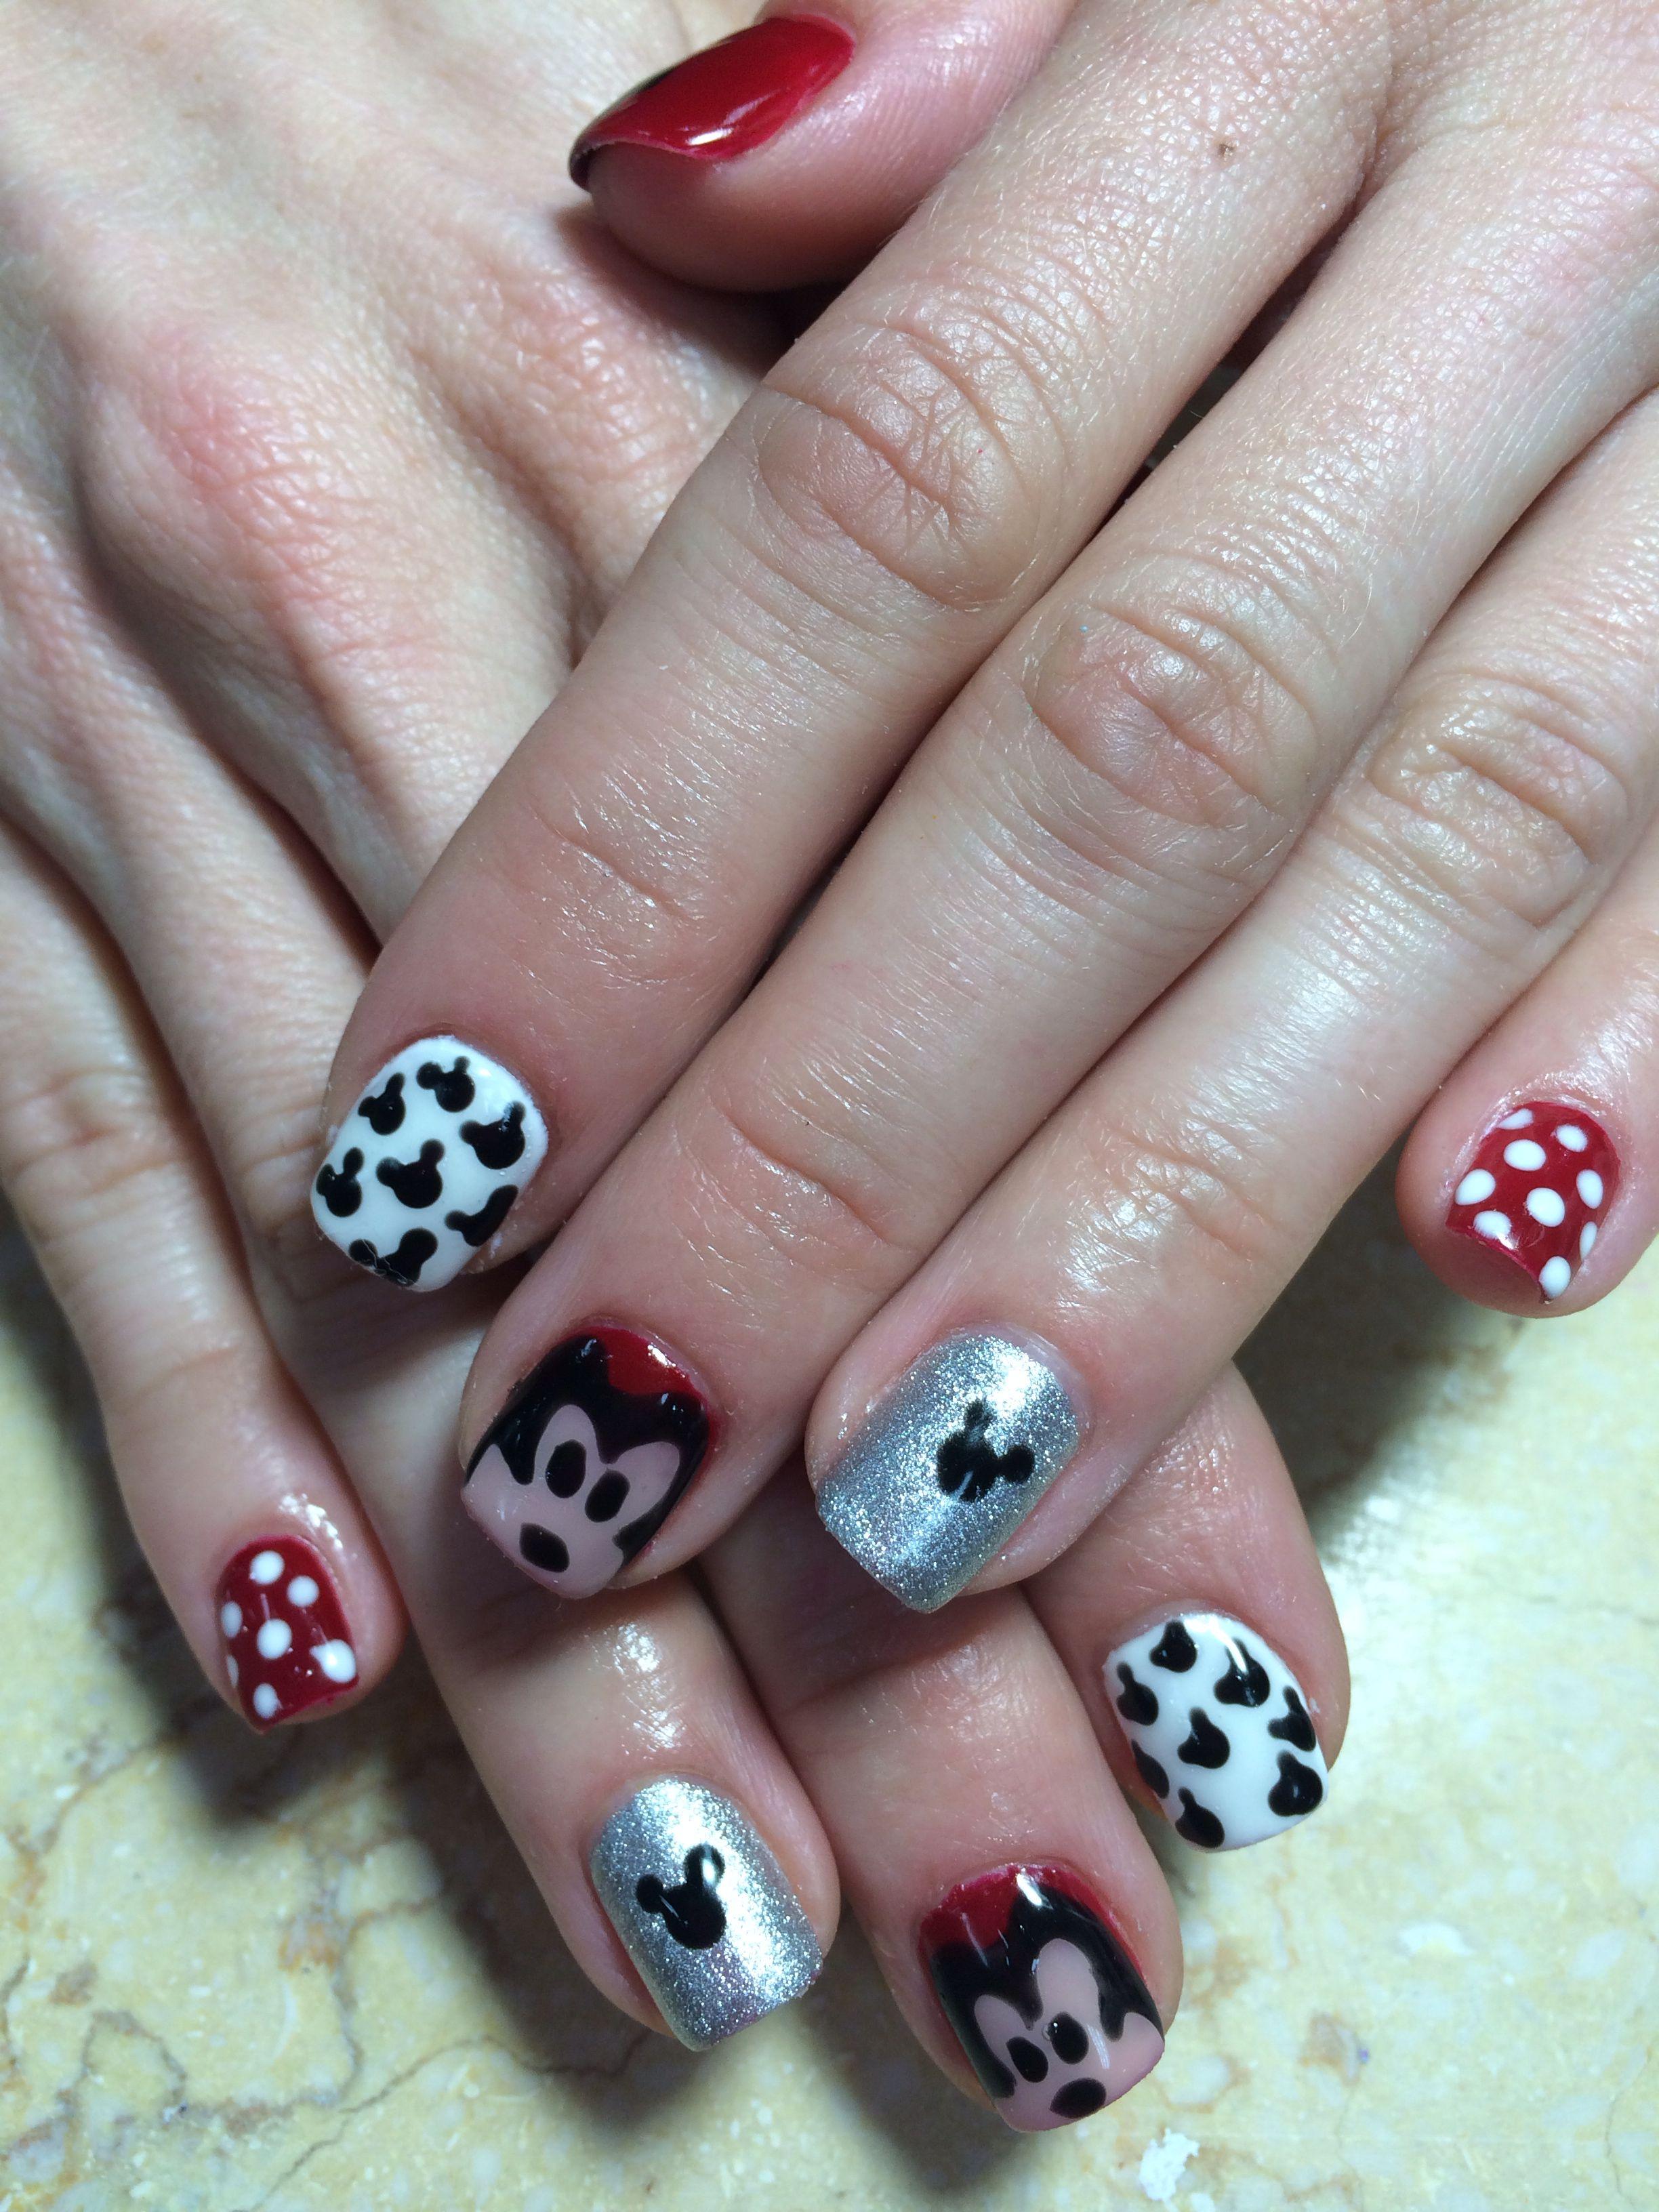 Disney land nails design ;)